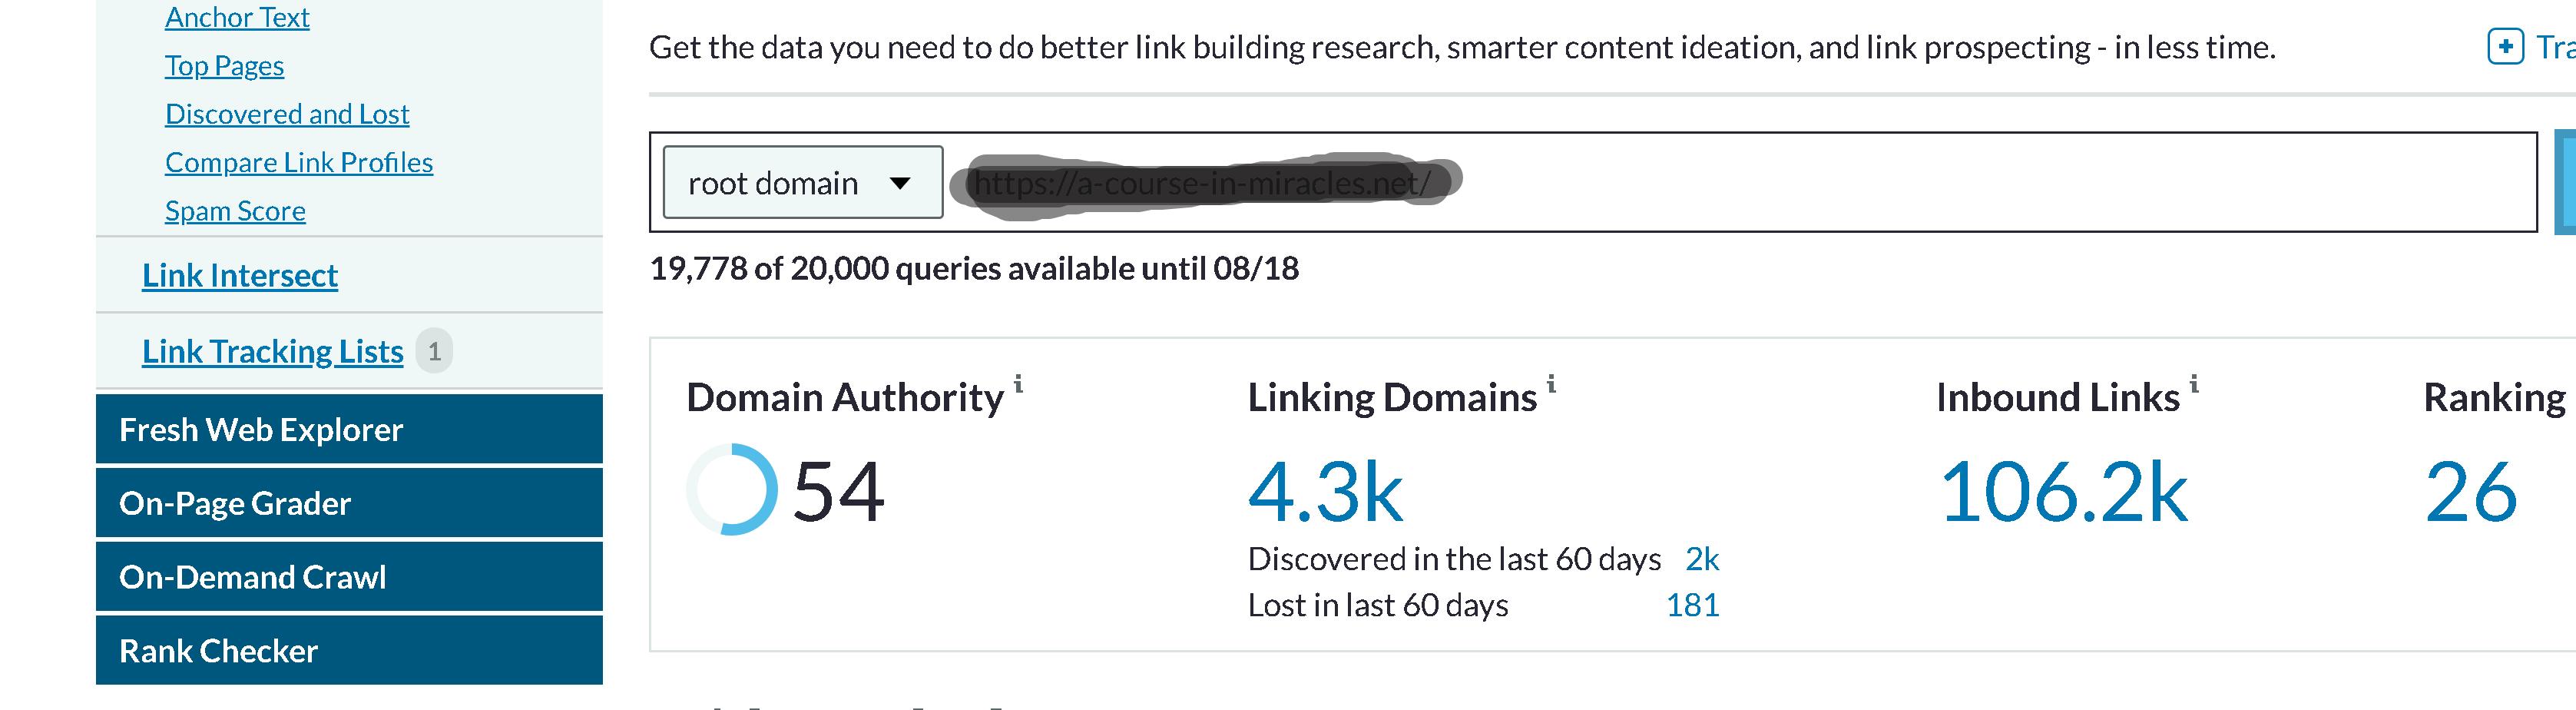 increase moz da domain authority 50 plus in 15 days